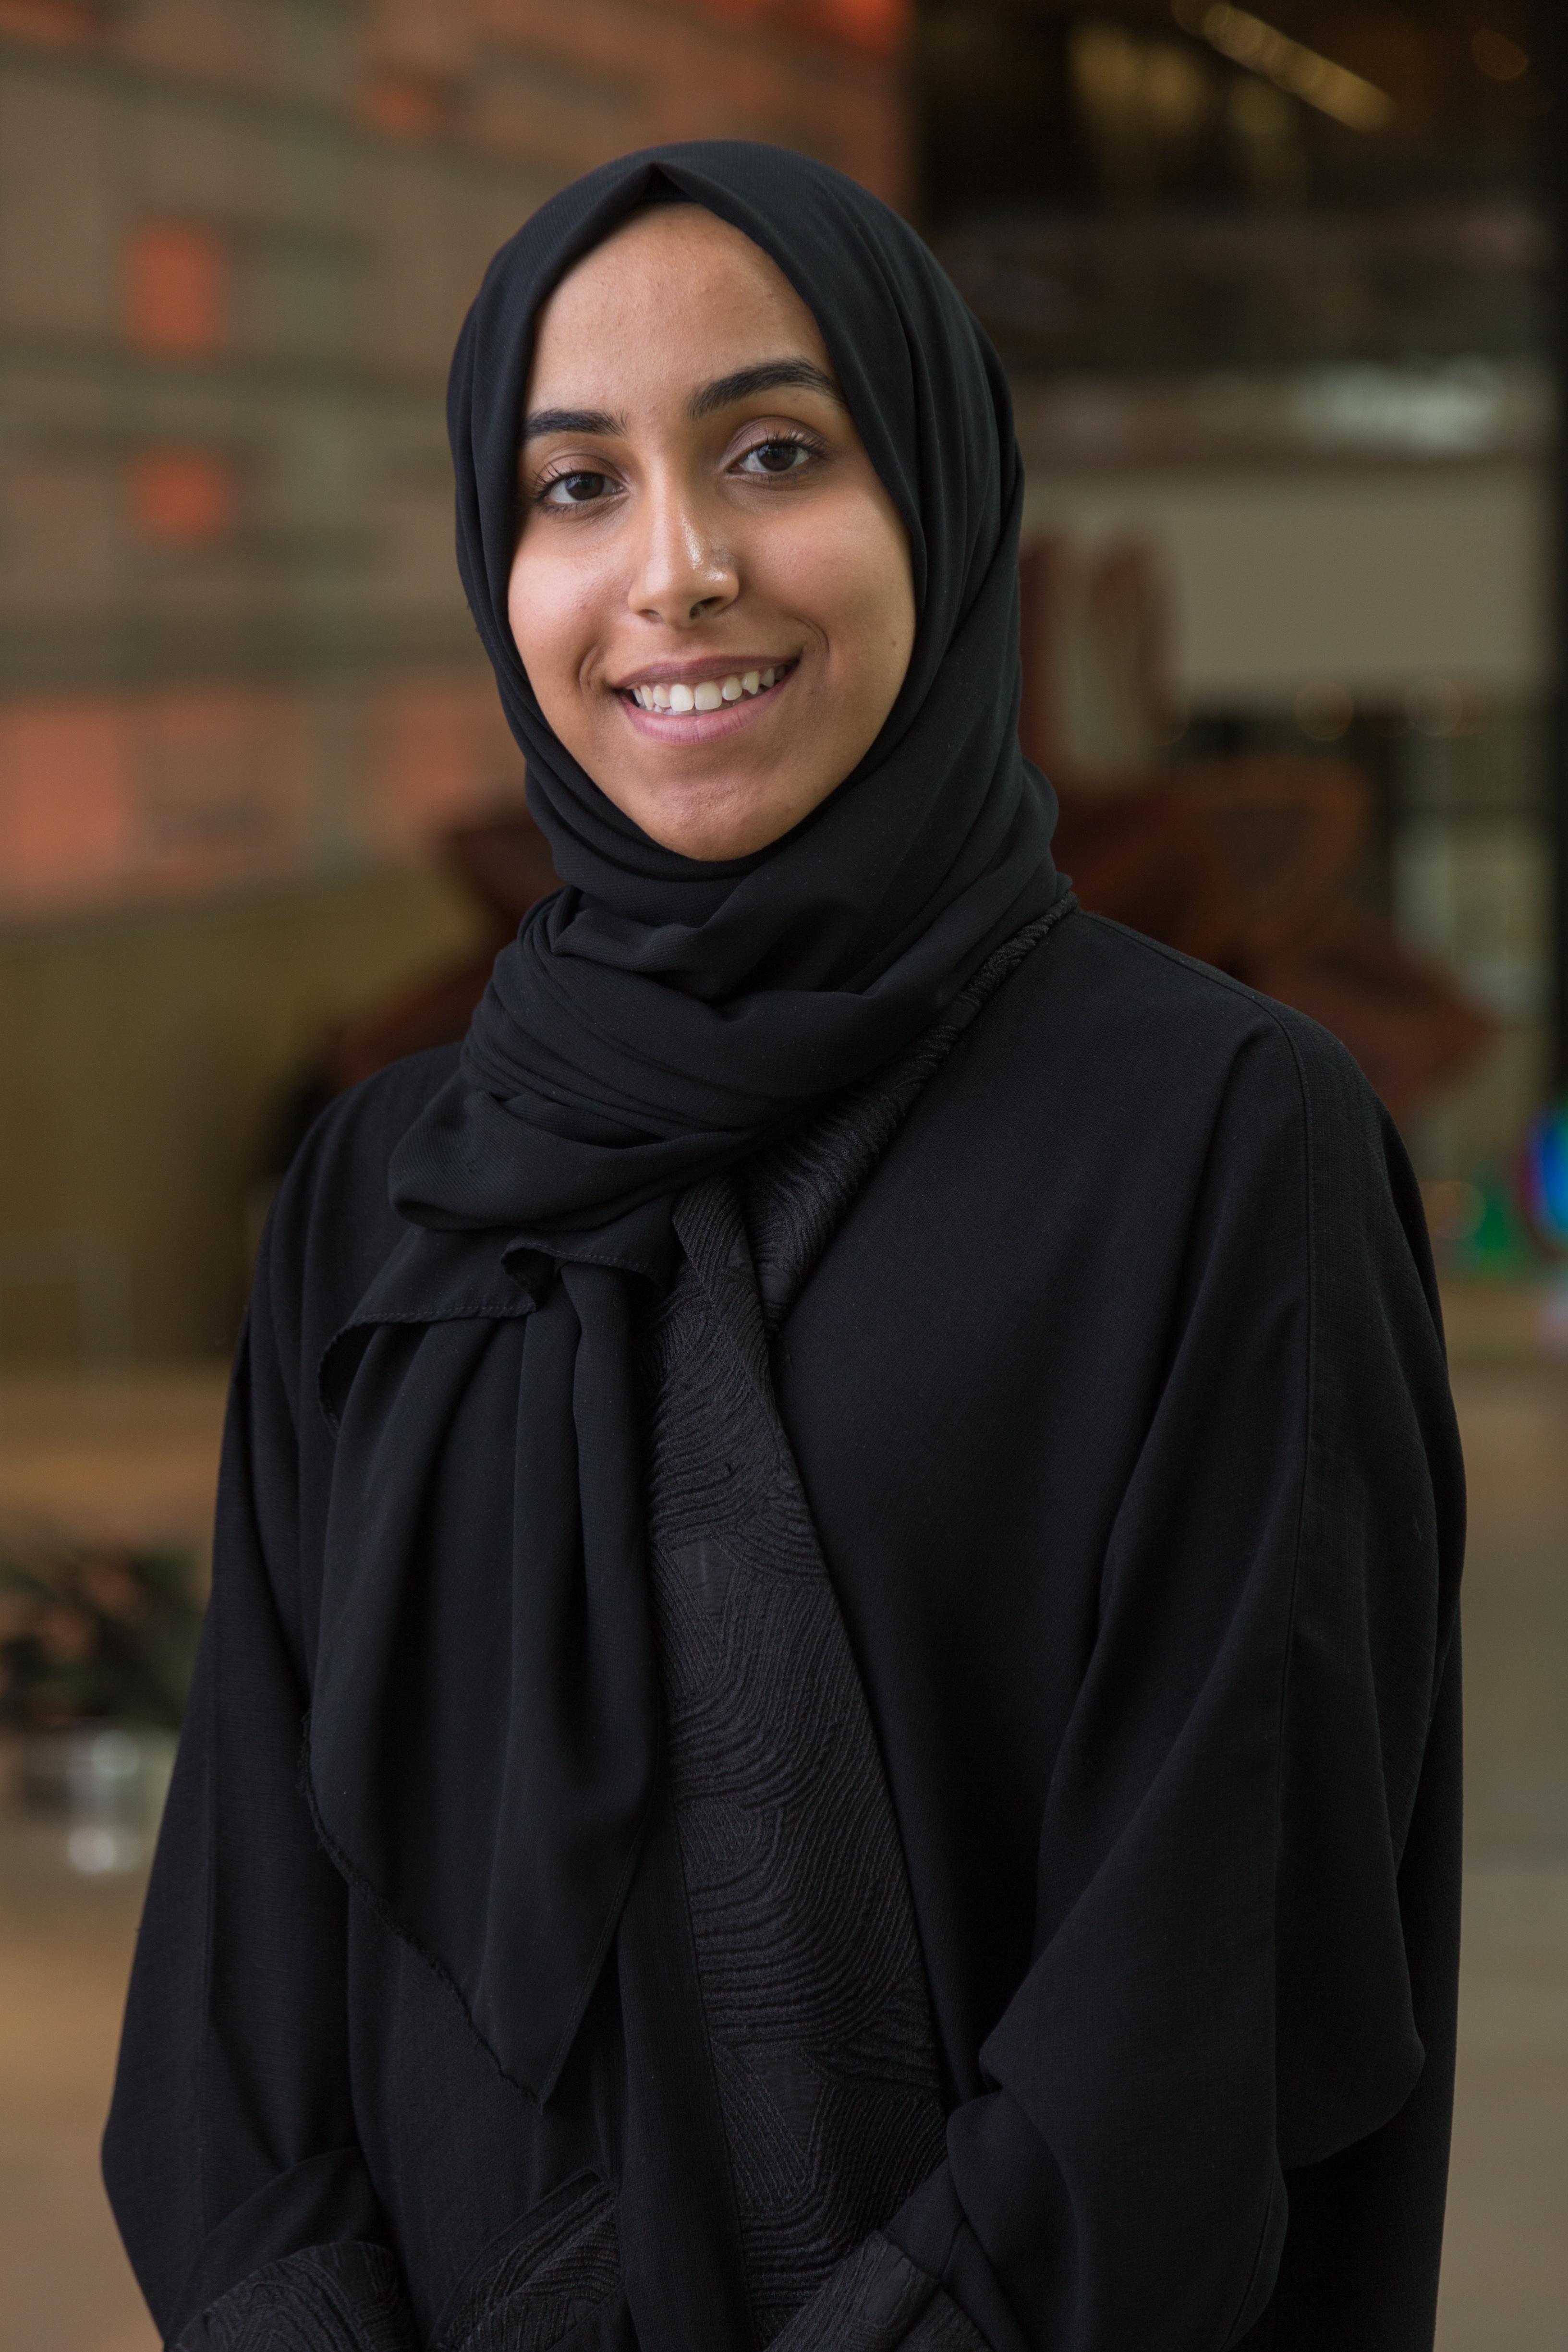 Student Enrichment Profile: Fatimah Alshaikh